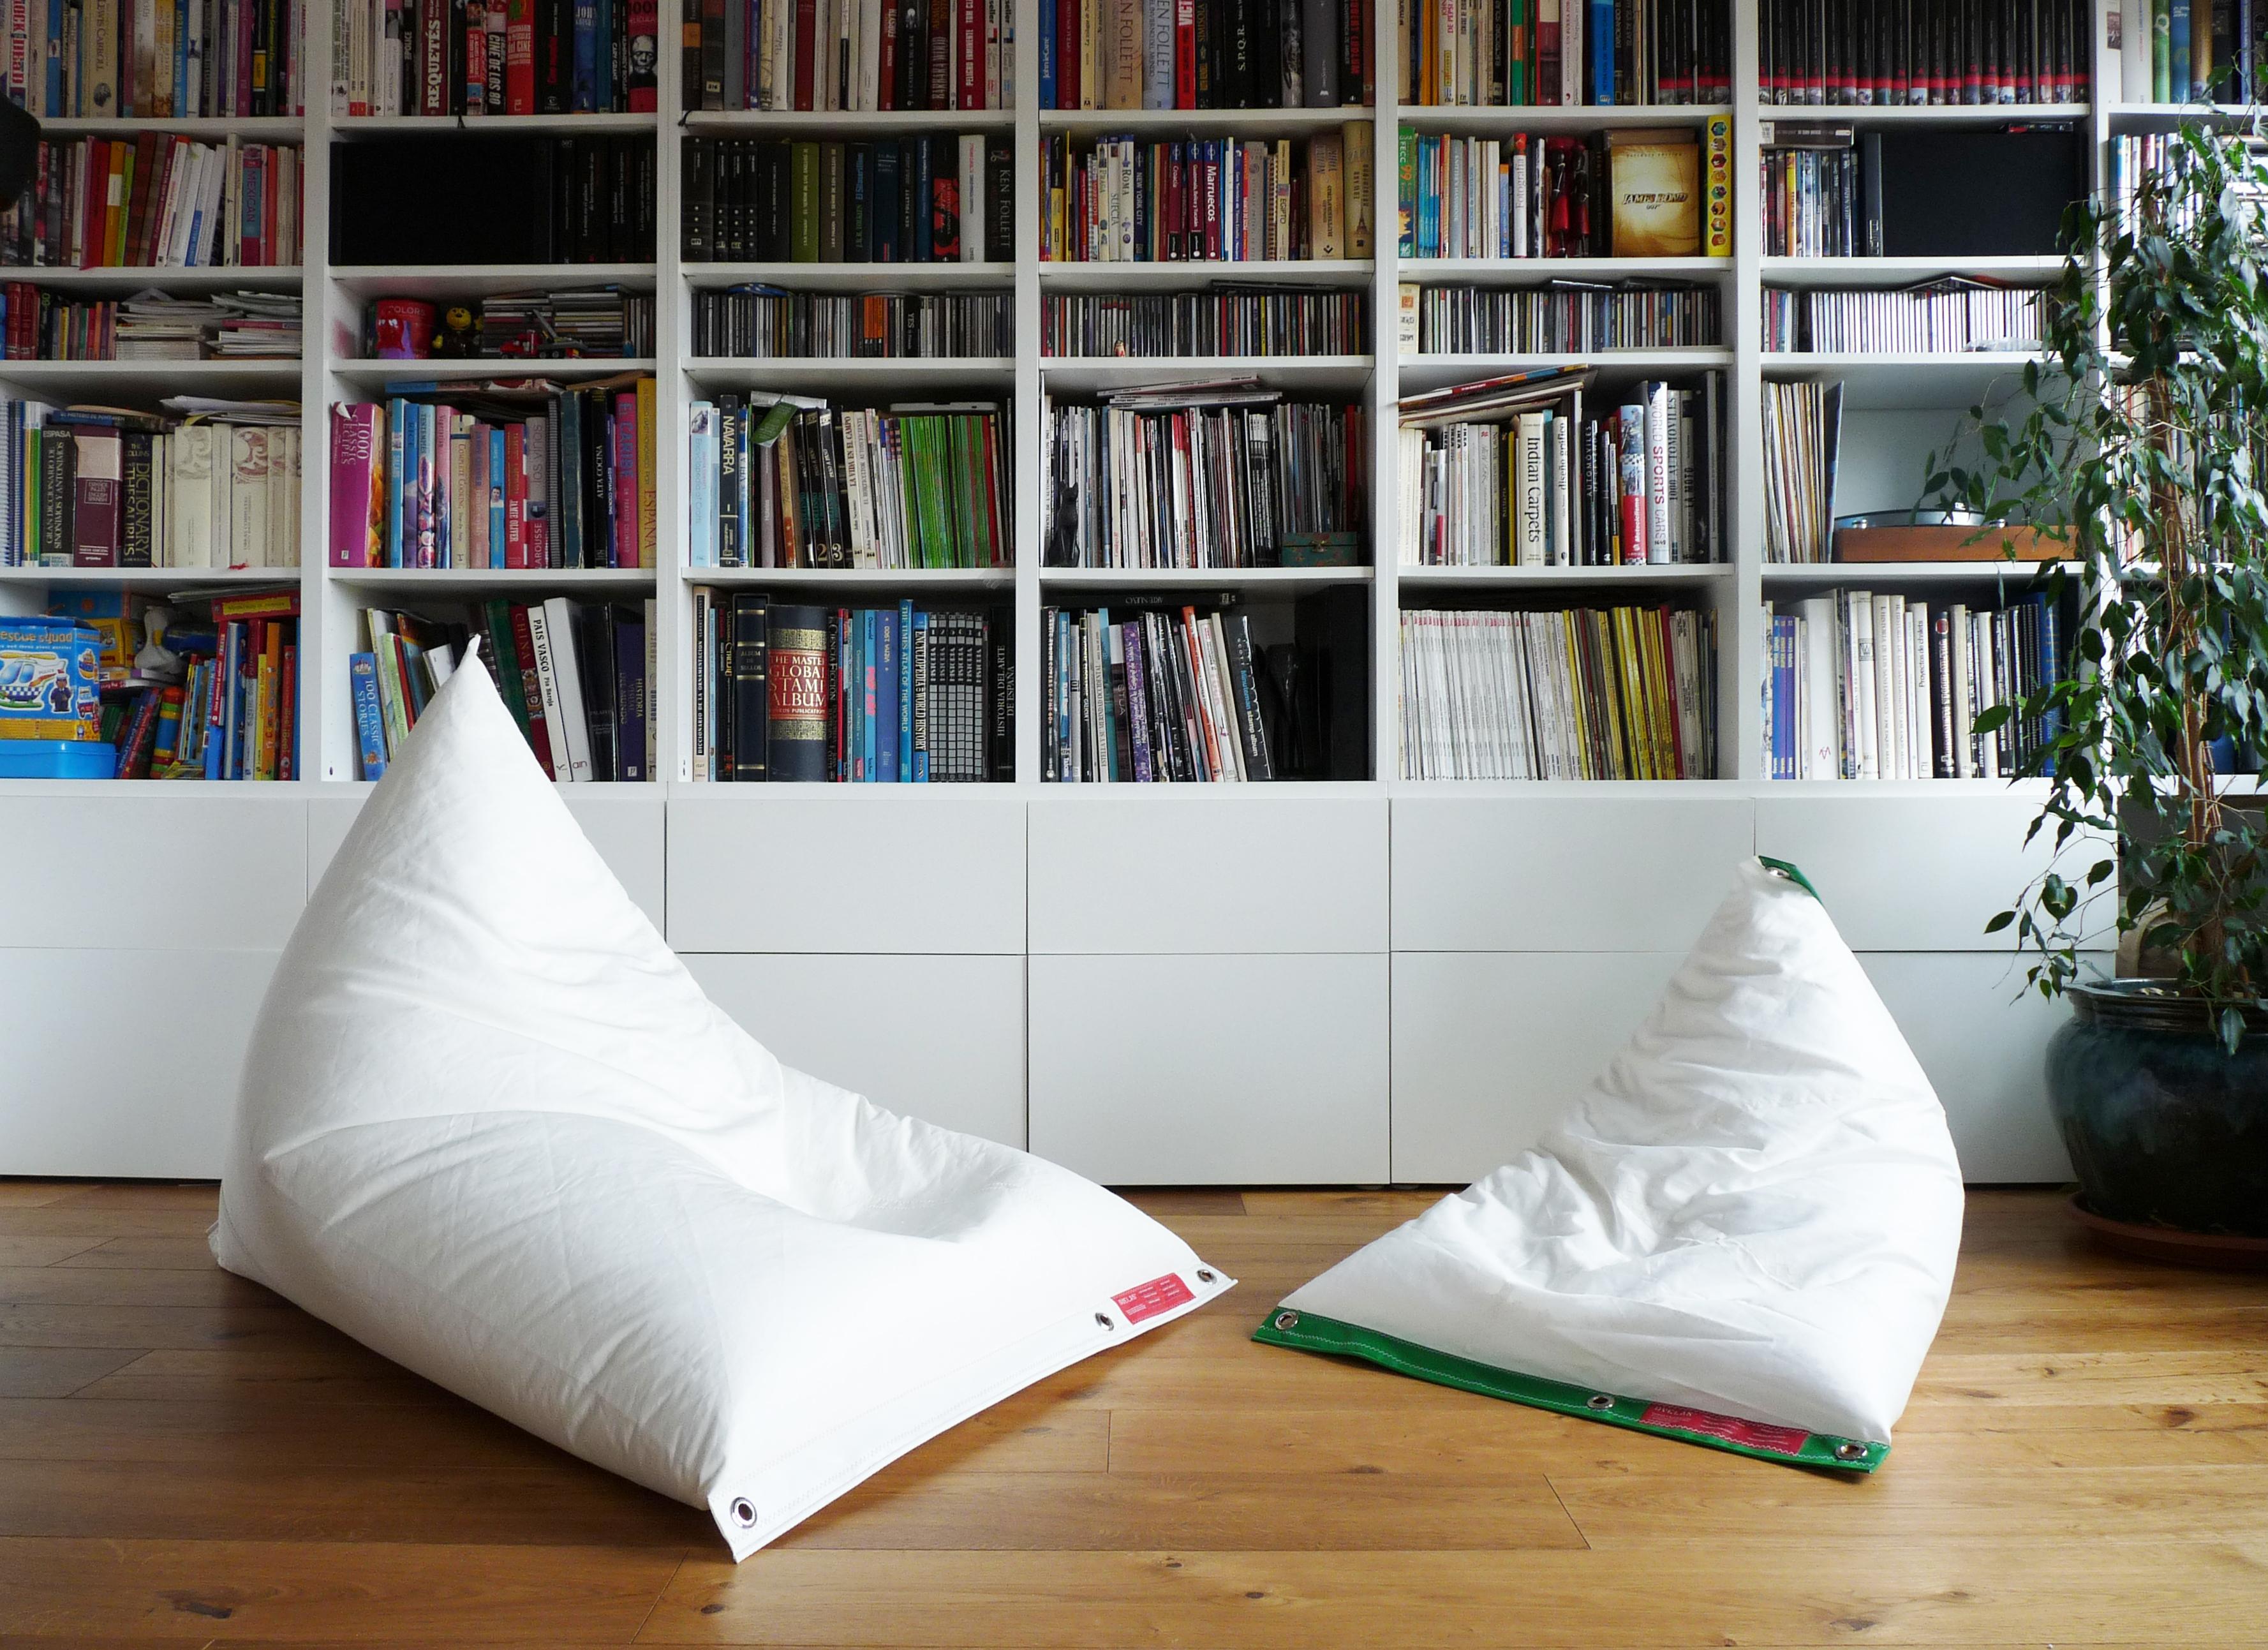 Fantastic Dvelas Genois Floating Bean Bag Unemploymentrelief Wooden Chair Designs For Living Room Unemploymentrelieforg